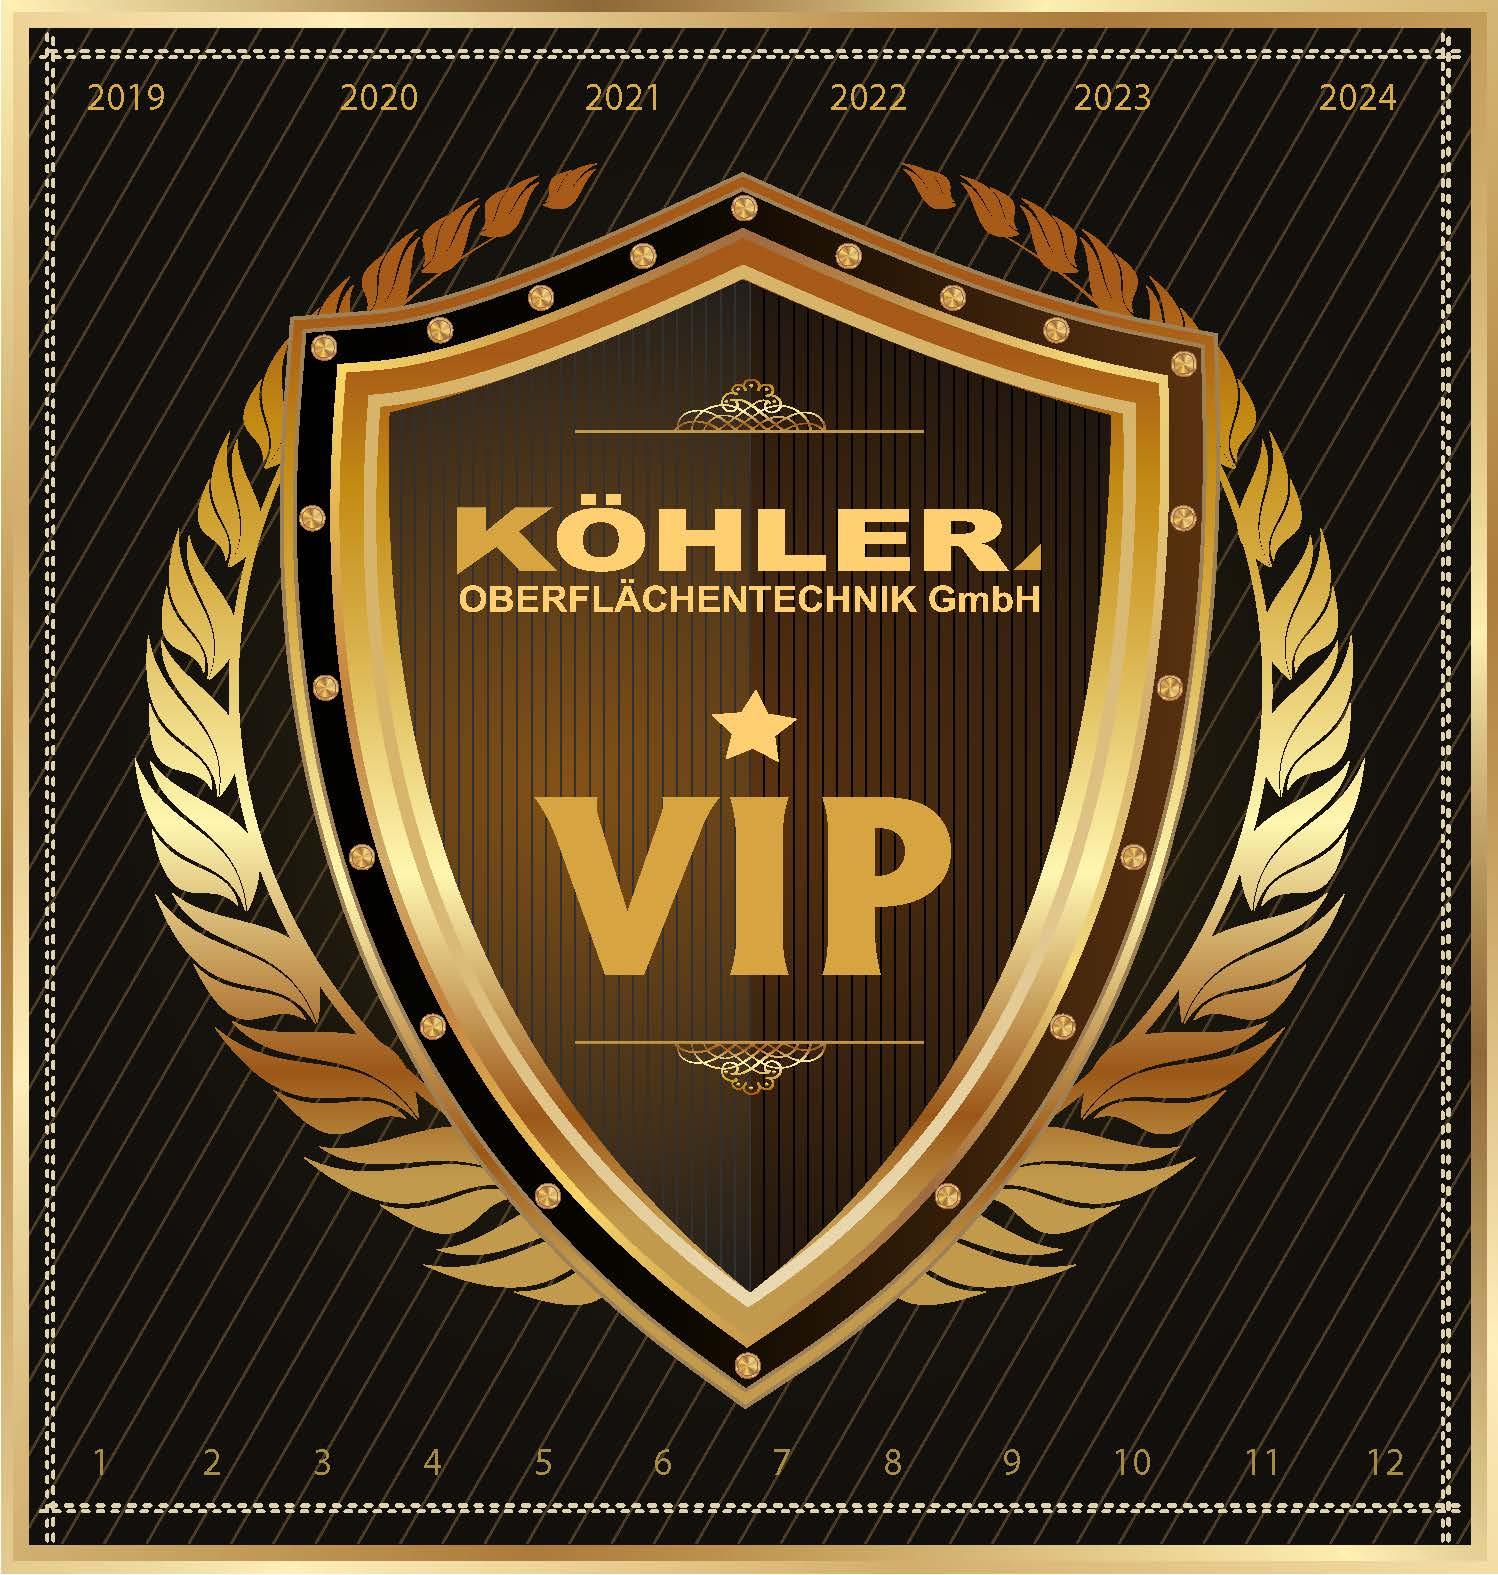 VIP-LOGO-ALLER-NEUSTES-25-02-2019-pdf